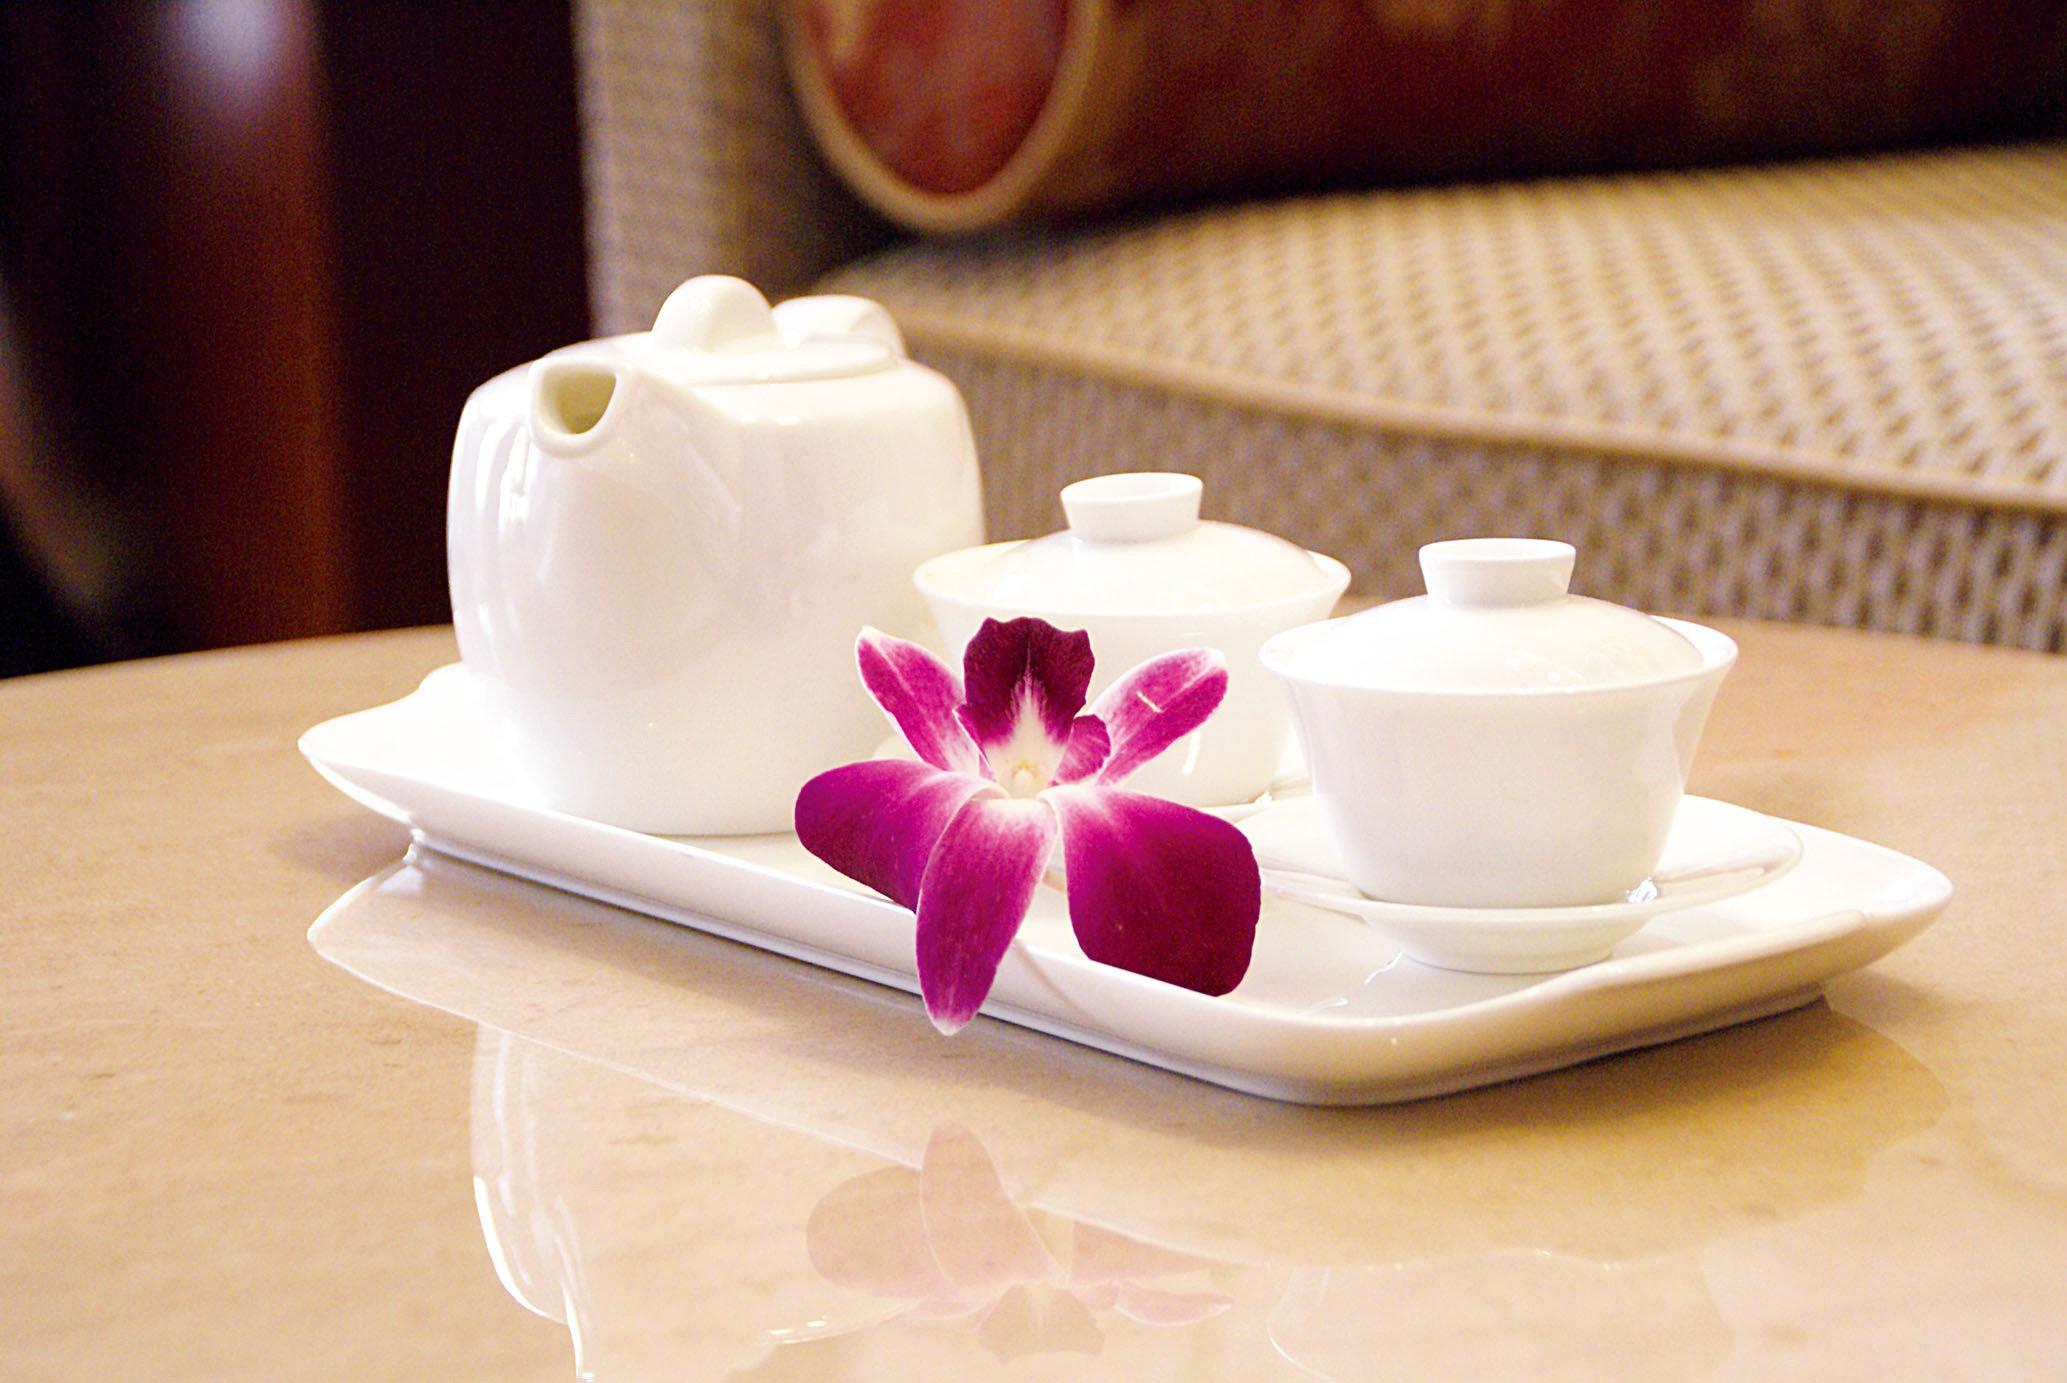 cup petal candle coffee cup lighting food ceramic flavor flower porcelain breakfast